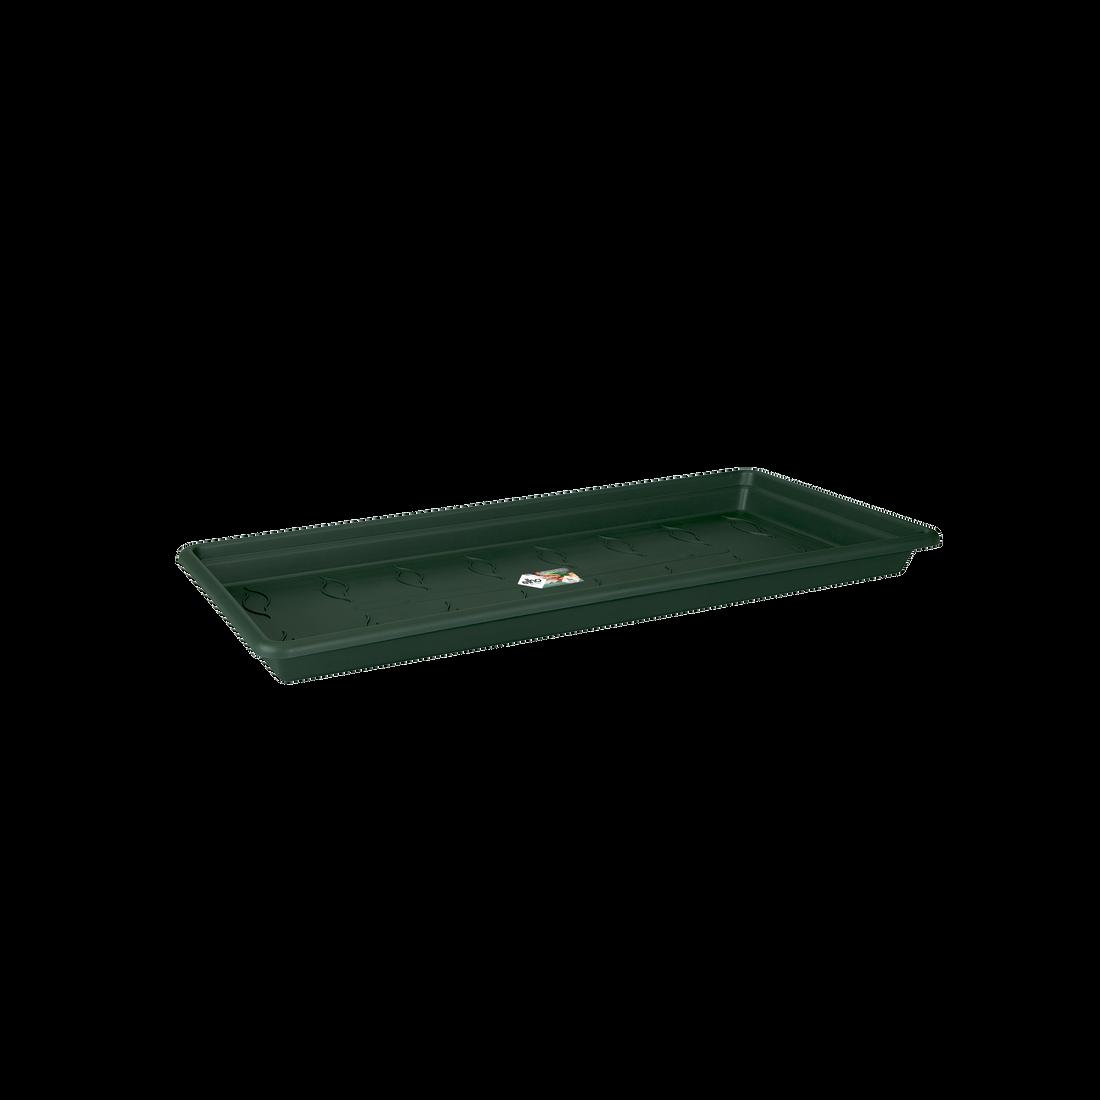 elho Universal Saucer Round Plato 3.1X3.1X0.065 cm Taupe